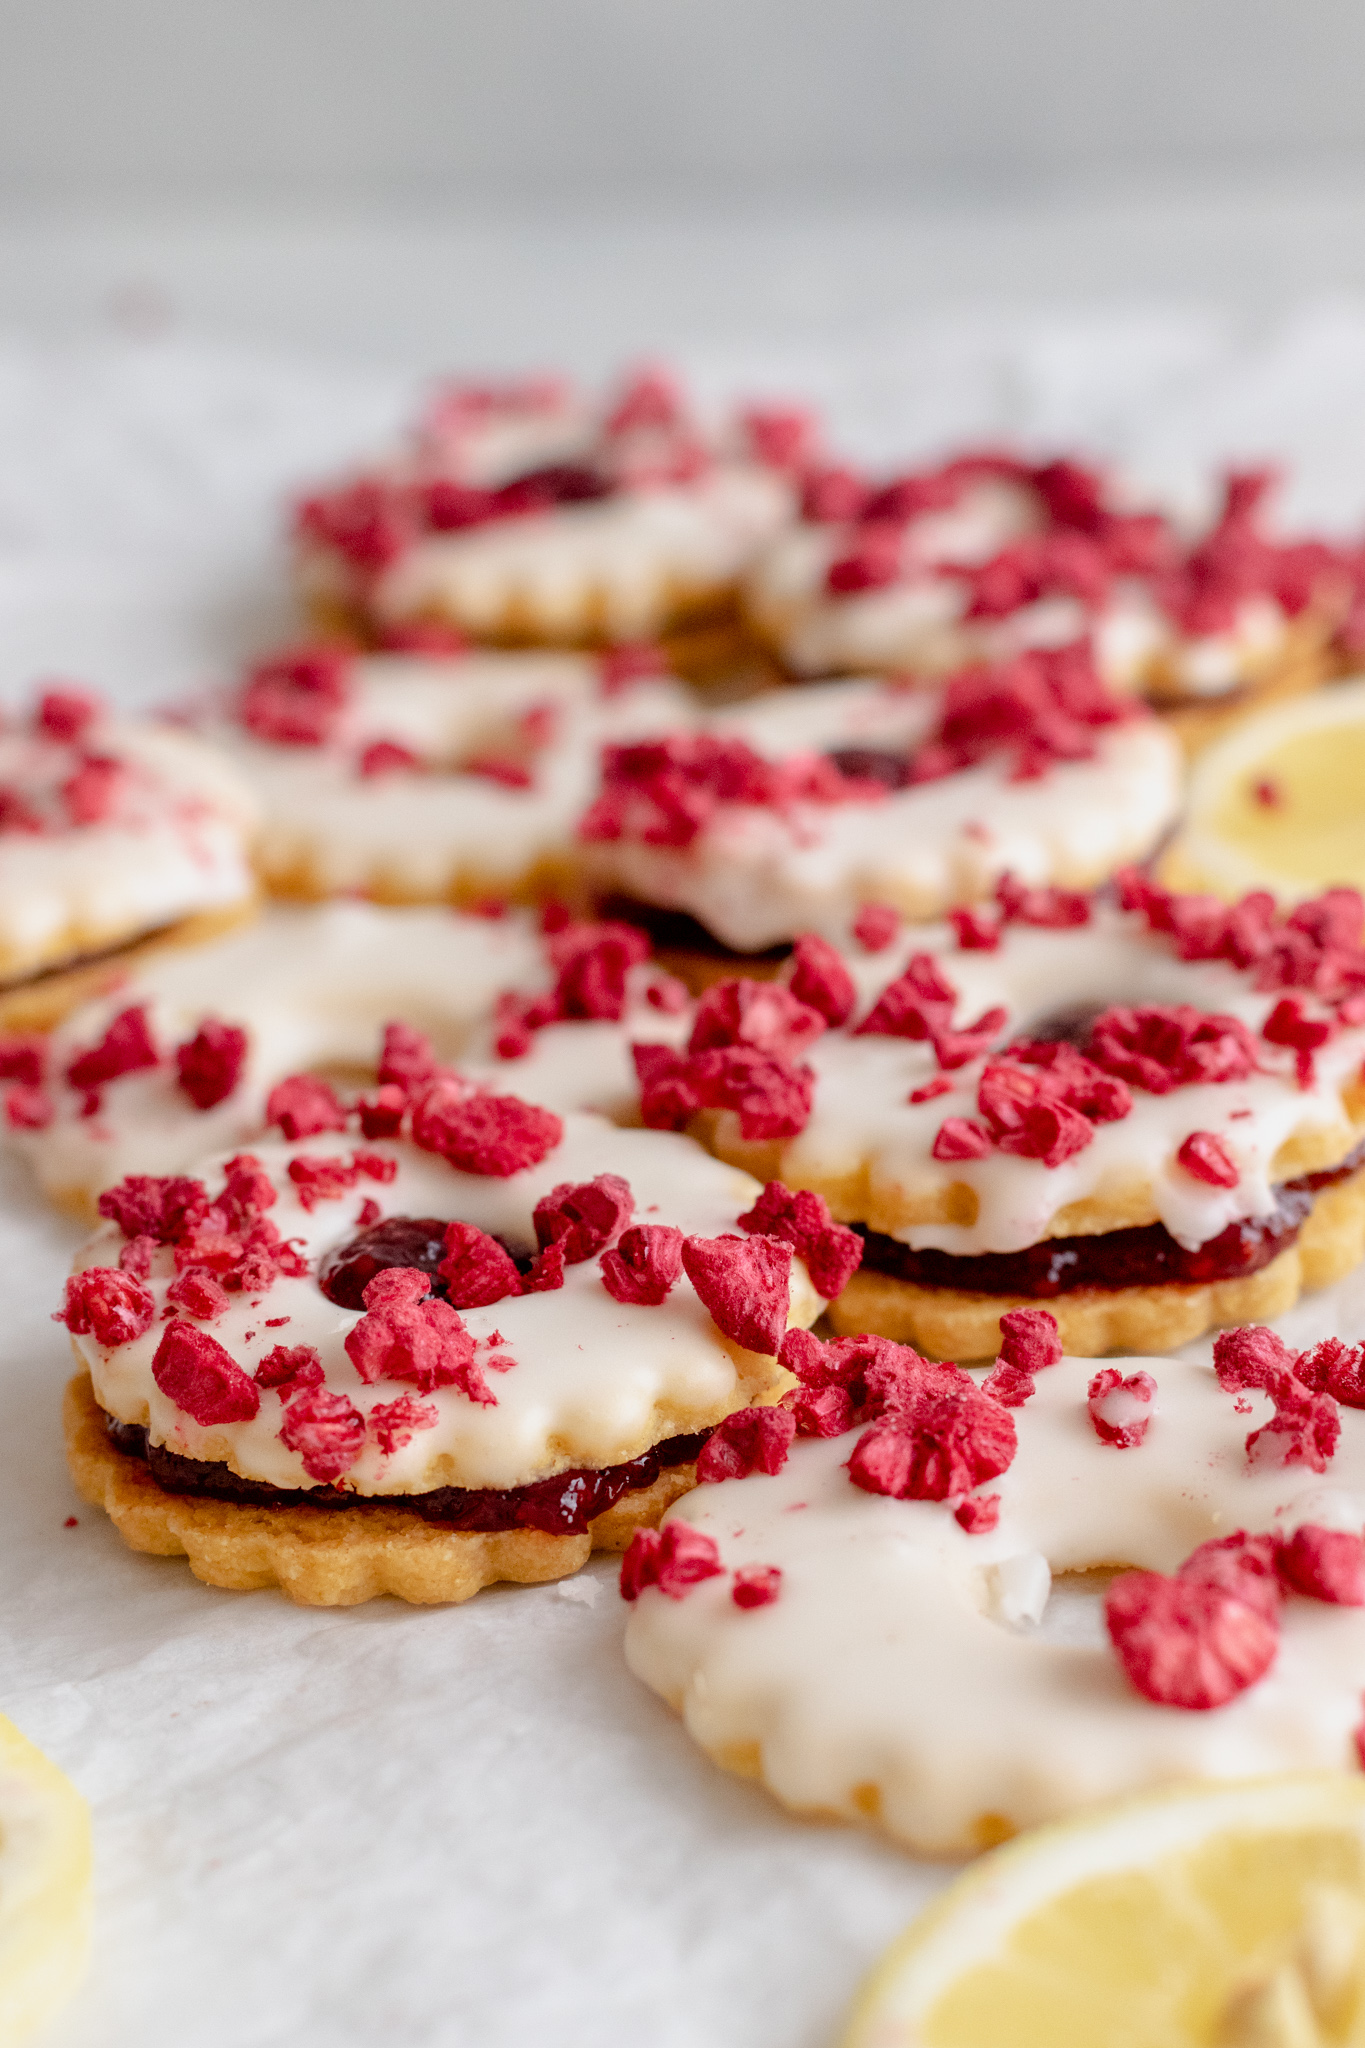 Image of raspberry zitronen ringe cookies sandwiched with raspberry jam